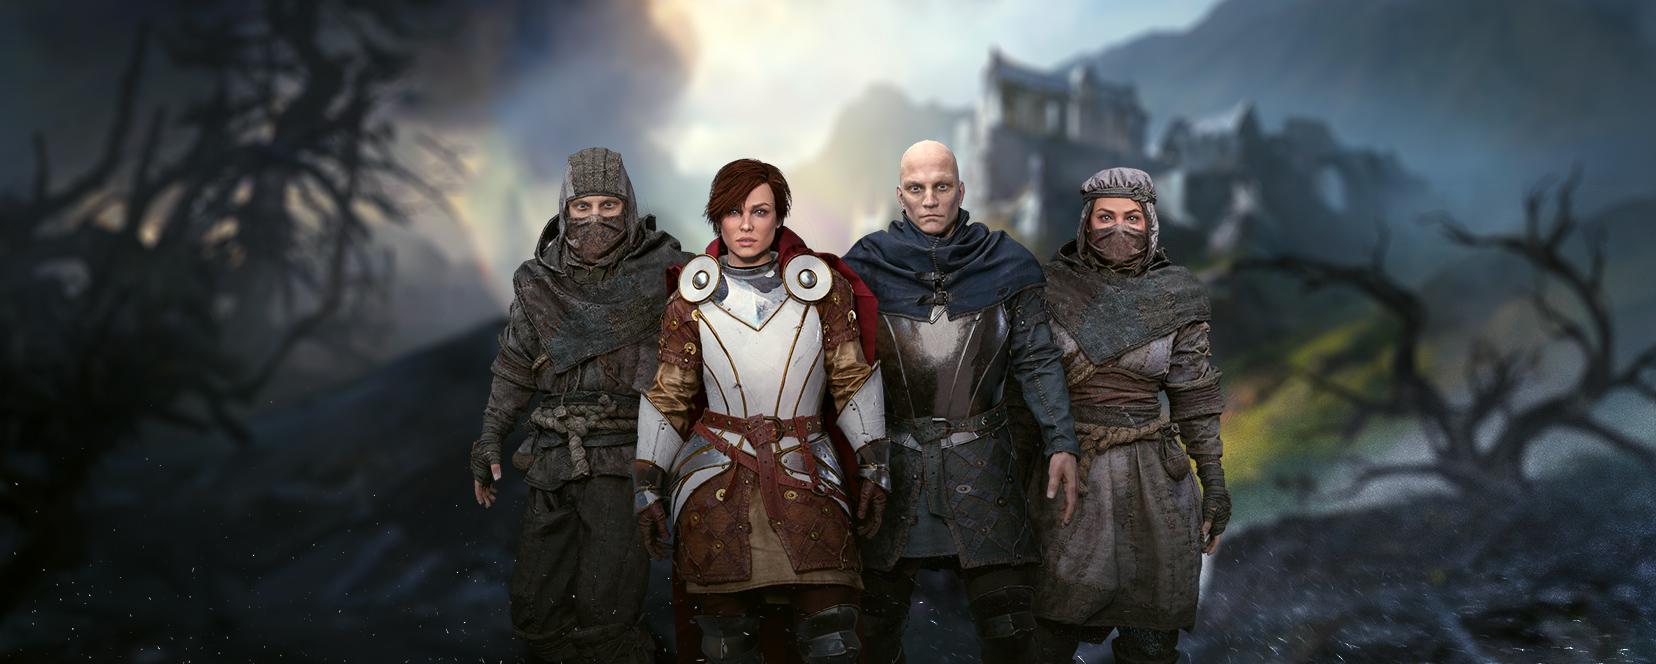 Avatars of Post Scriptum characters in our social portal for gamers, Caer Sidi Hub (VR Hub)